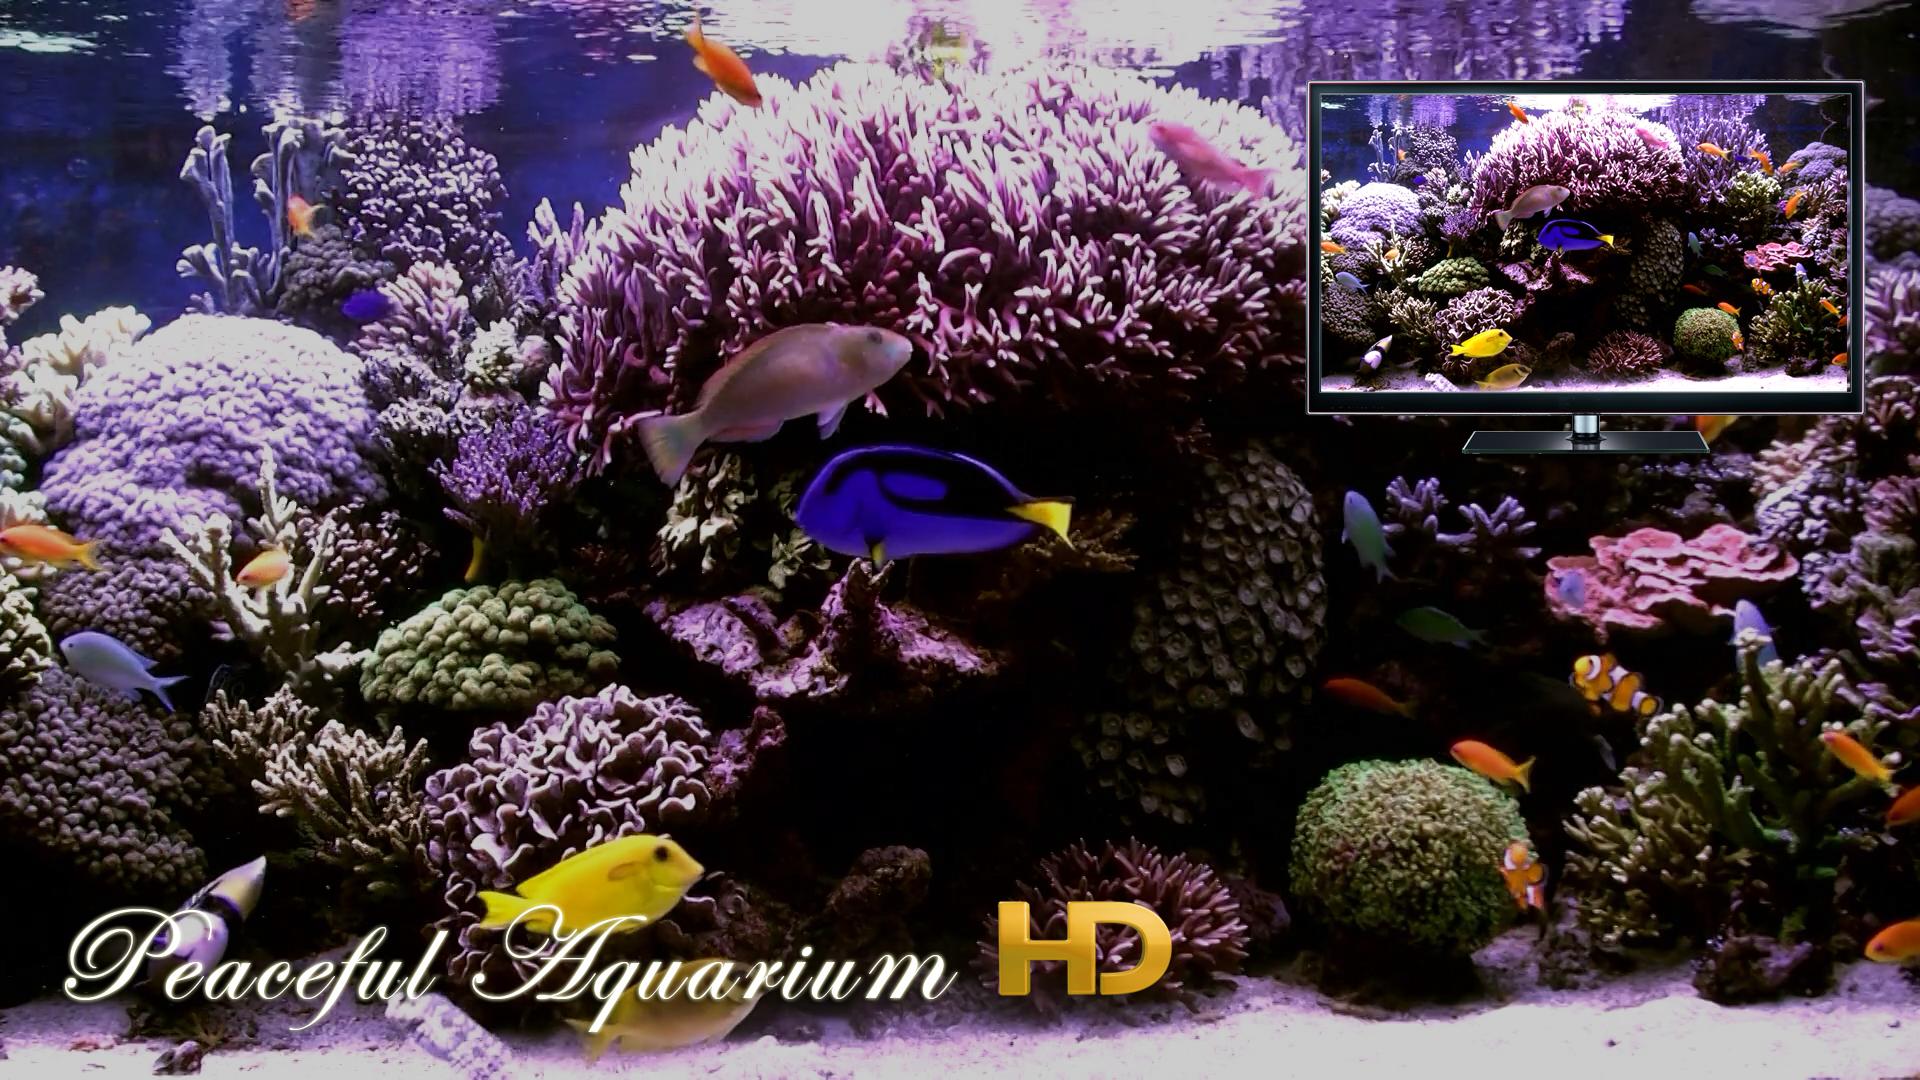 Peaceful Aquarium HD screenshot 11